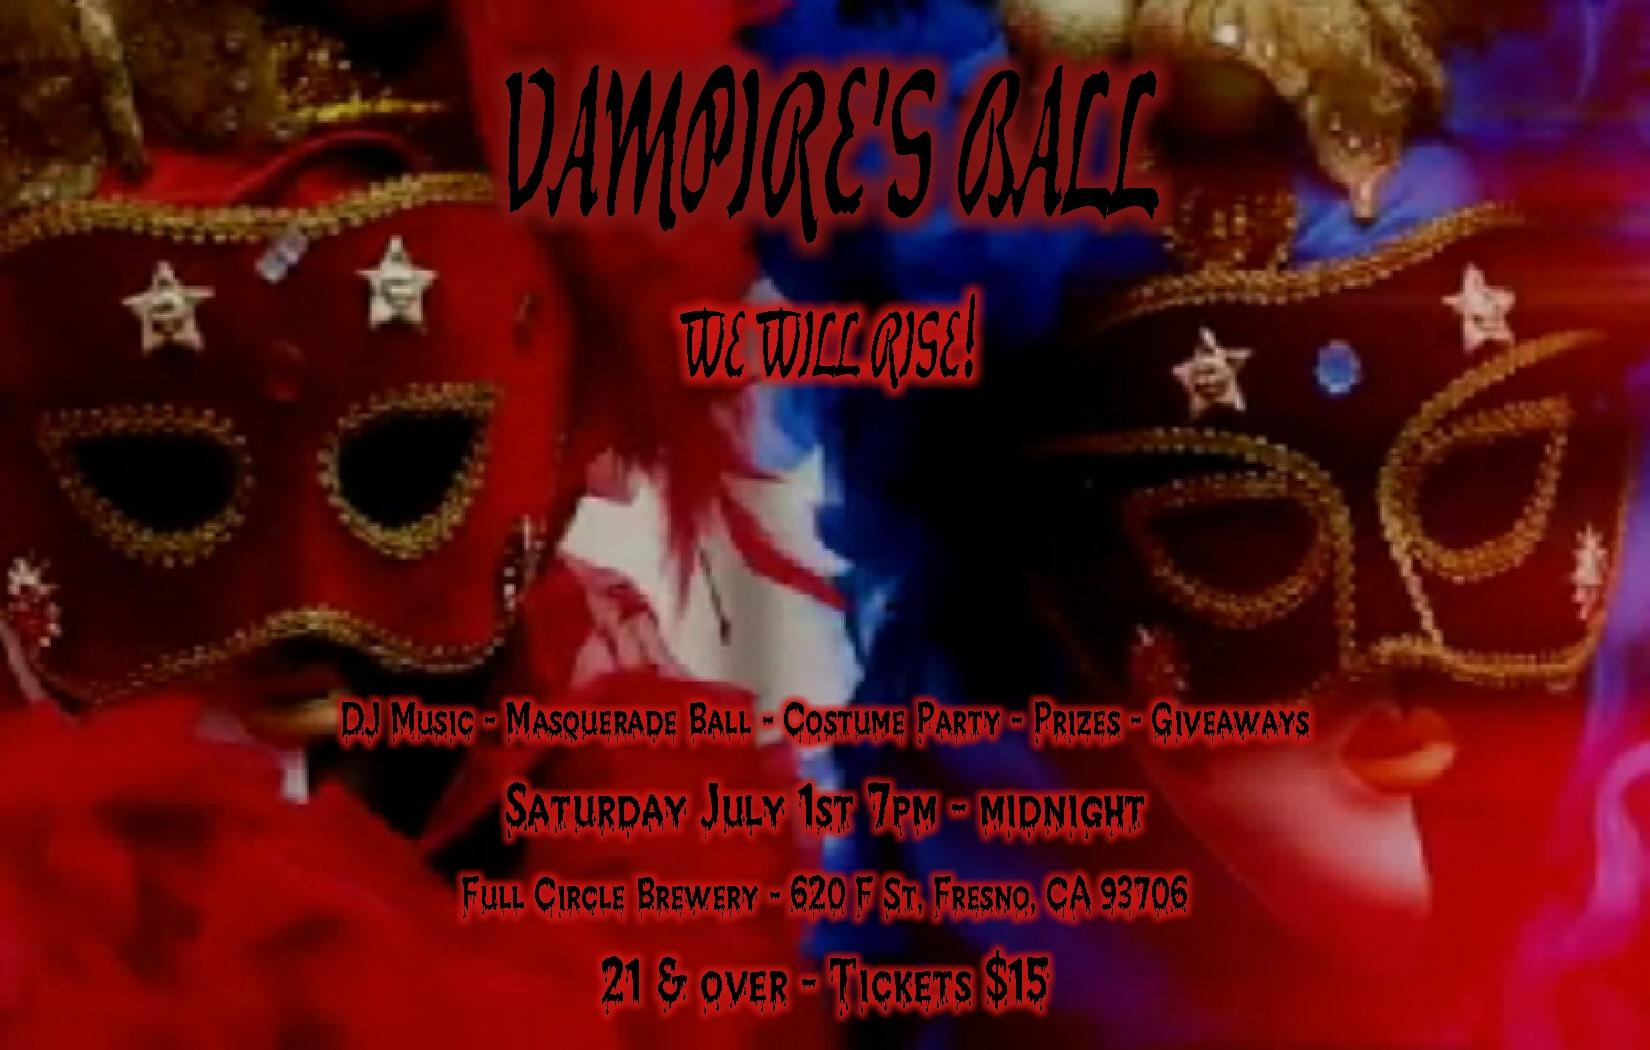 Vampire's Ball - Masquerade Ball